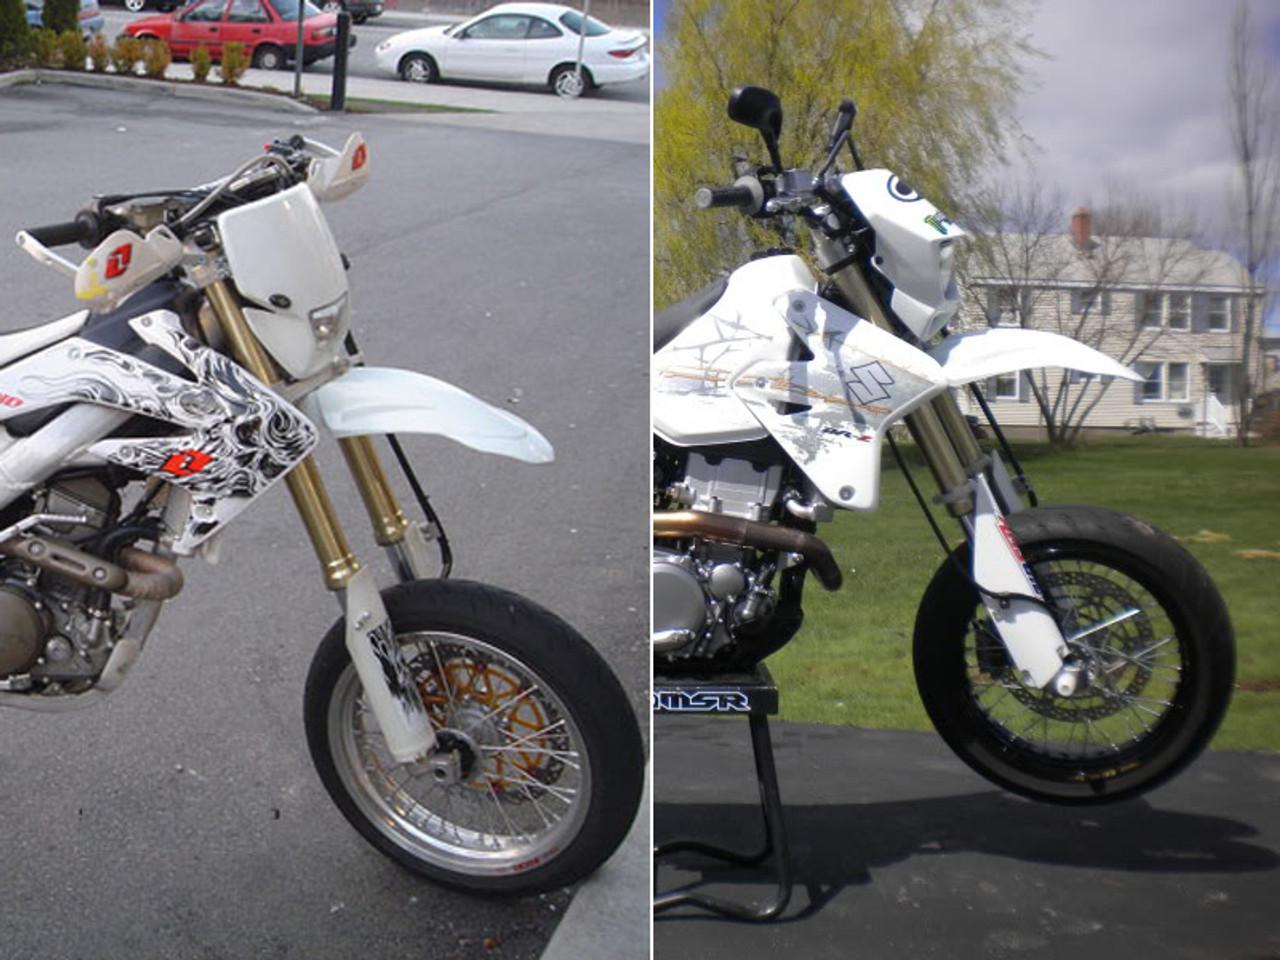 1x Off Road Motocross Rear Fender Mudguard Universal Enduro For Supermotor Bikes